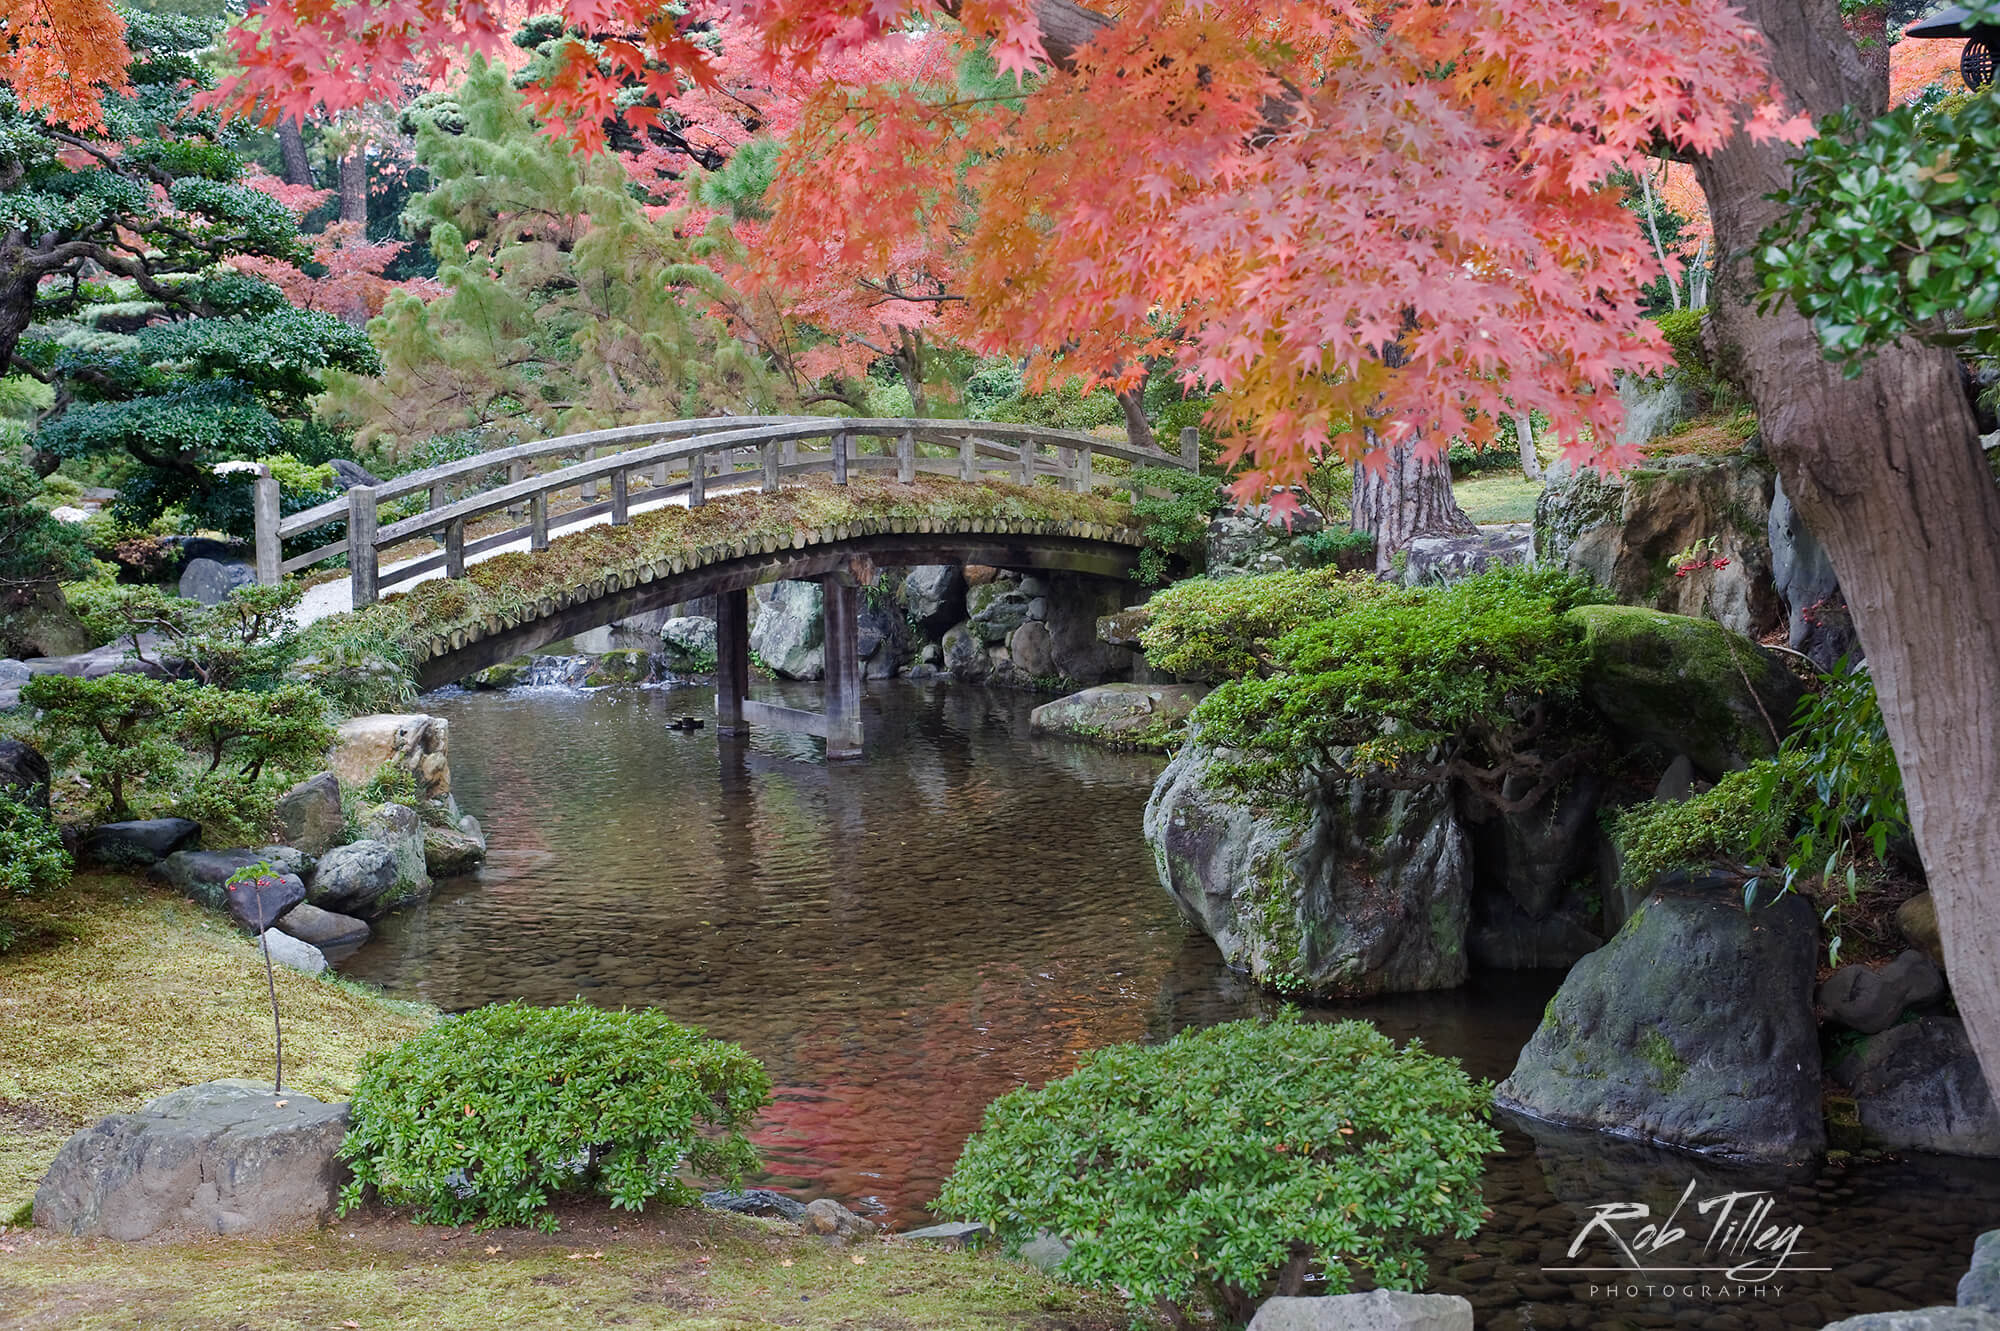 Kyoto Imperial Palace Garden I